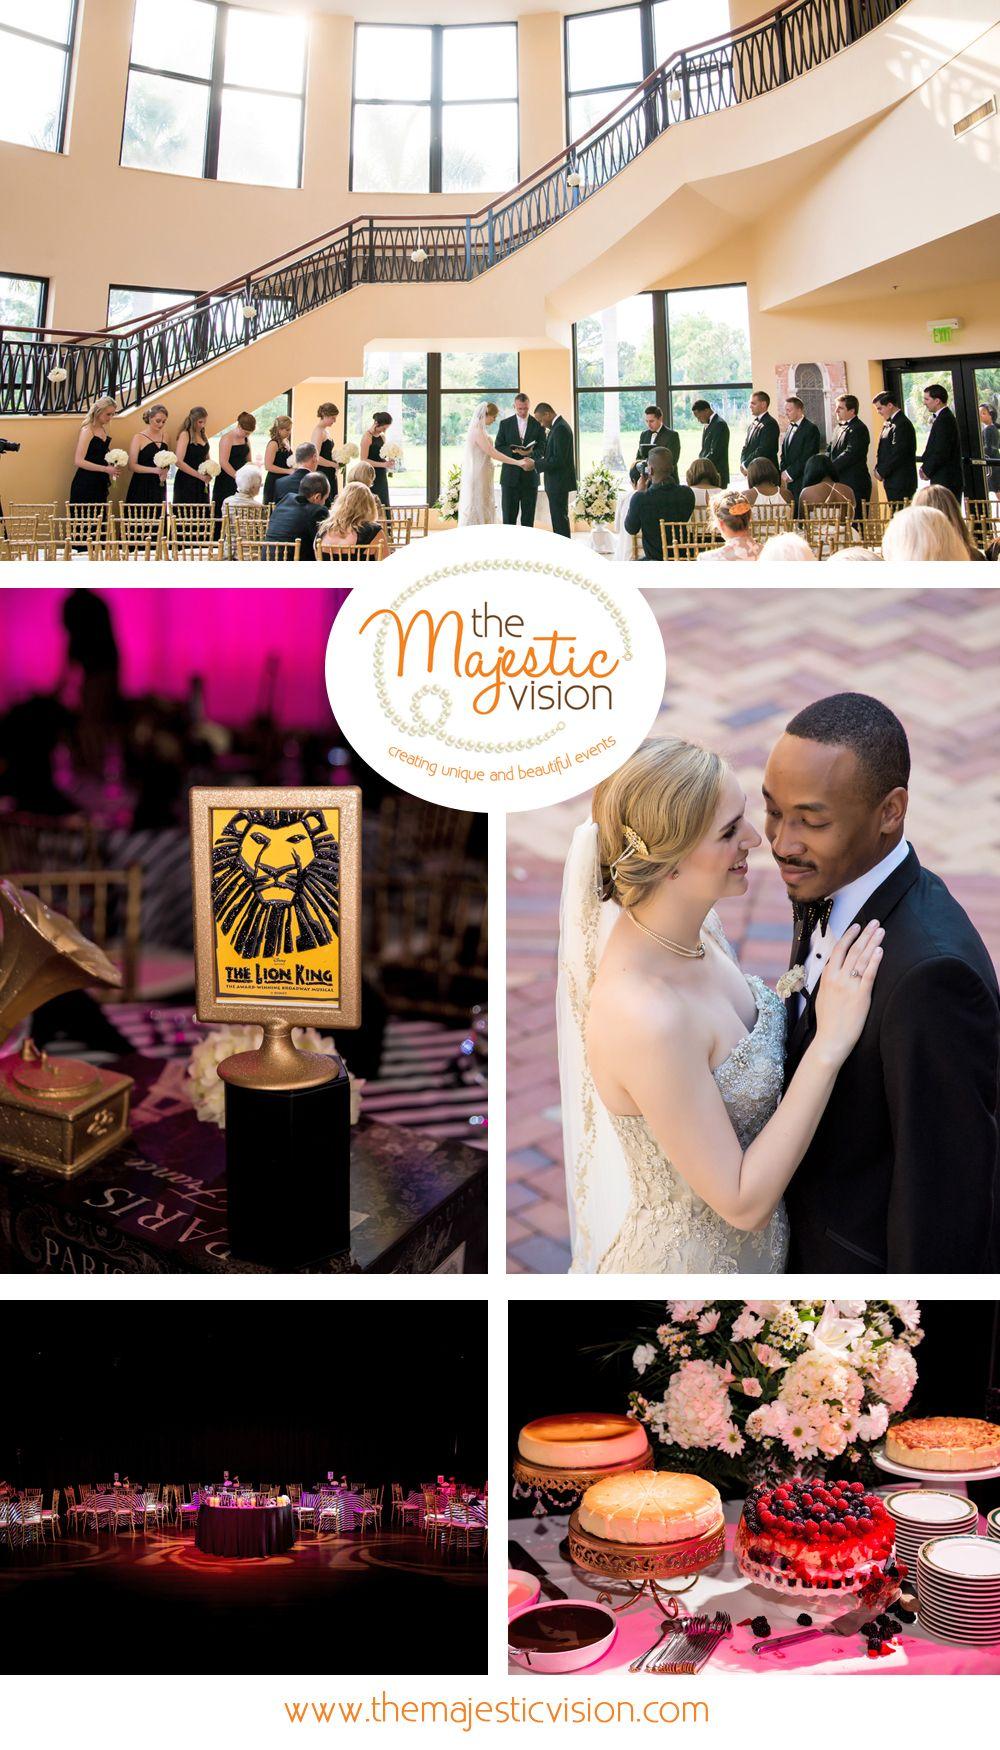 Elegant Broadway Theme Wedding Reception The Majestic Vision Planning Borland Center In Palm Beach Fl Www Themajesticvision